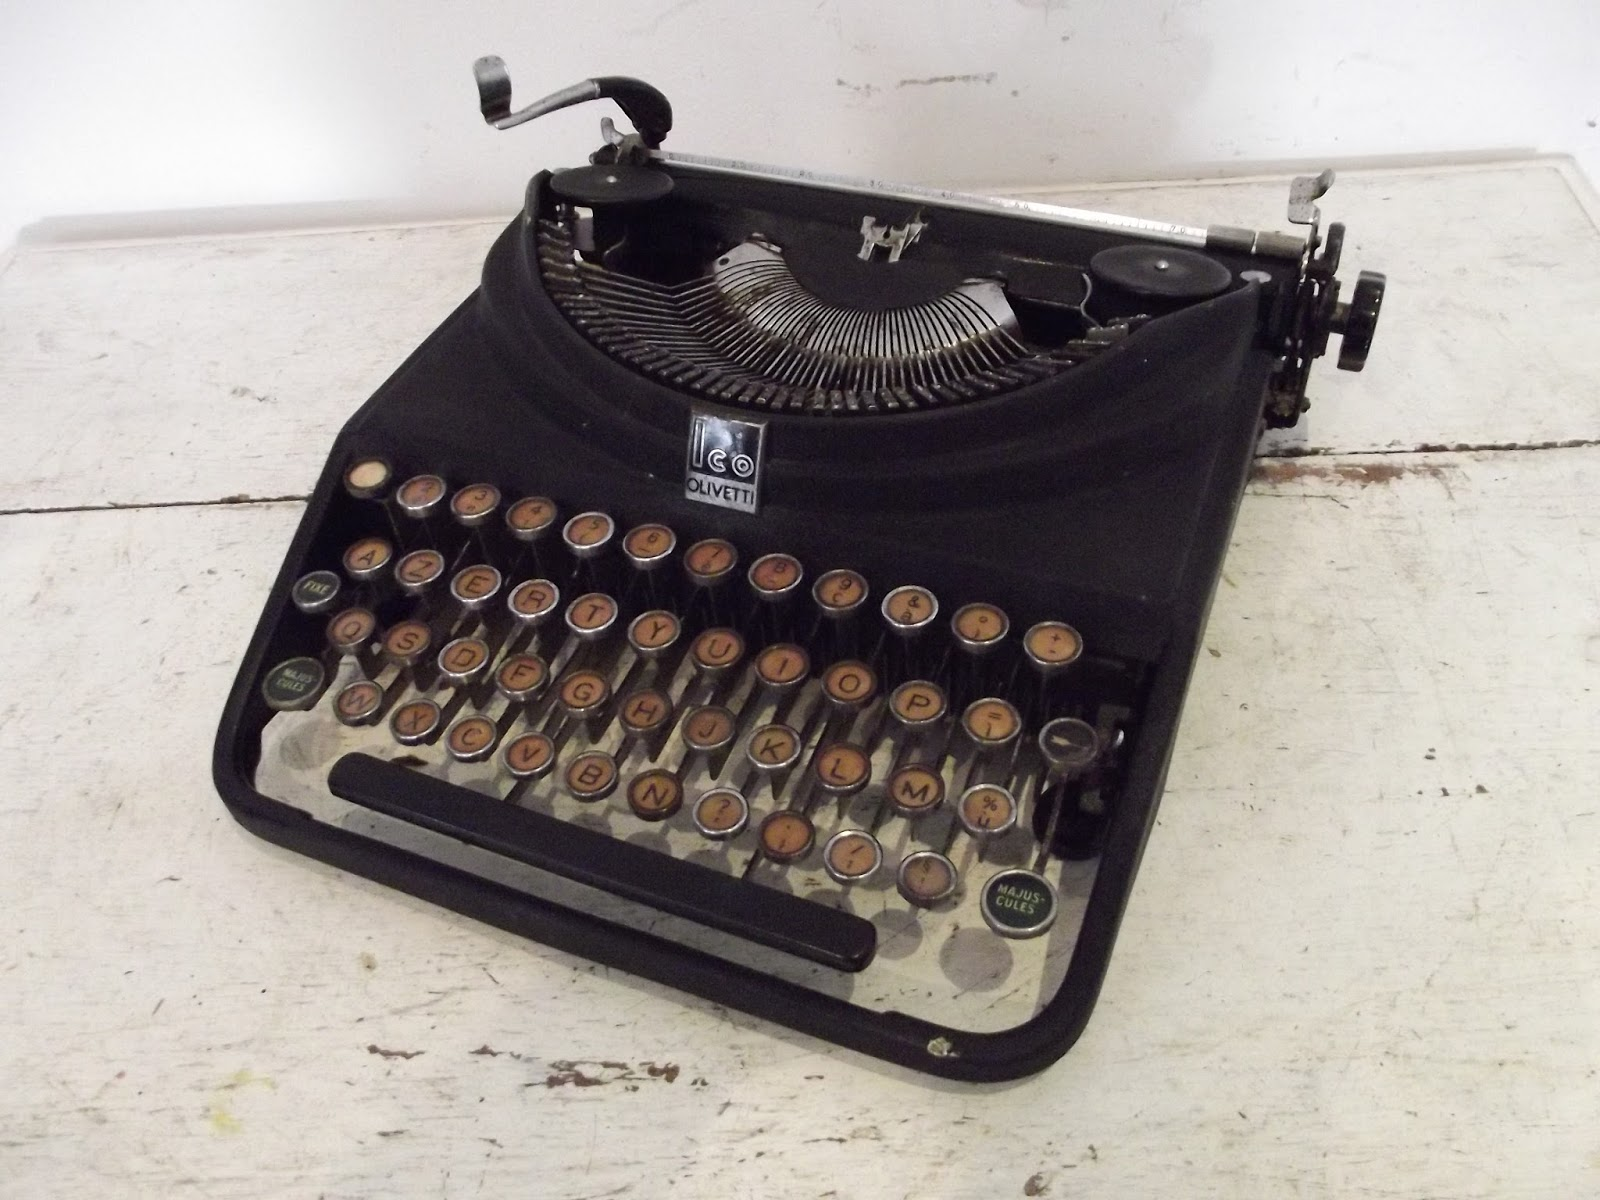 rare machine a crire vintage olivetti ico mp1 1934 typewriter original. Black Bedroom Furniture Sets. Home Design Ideas